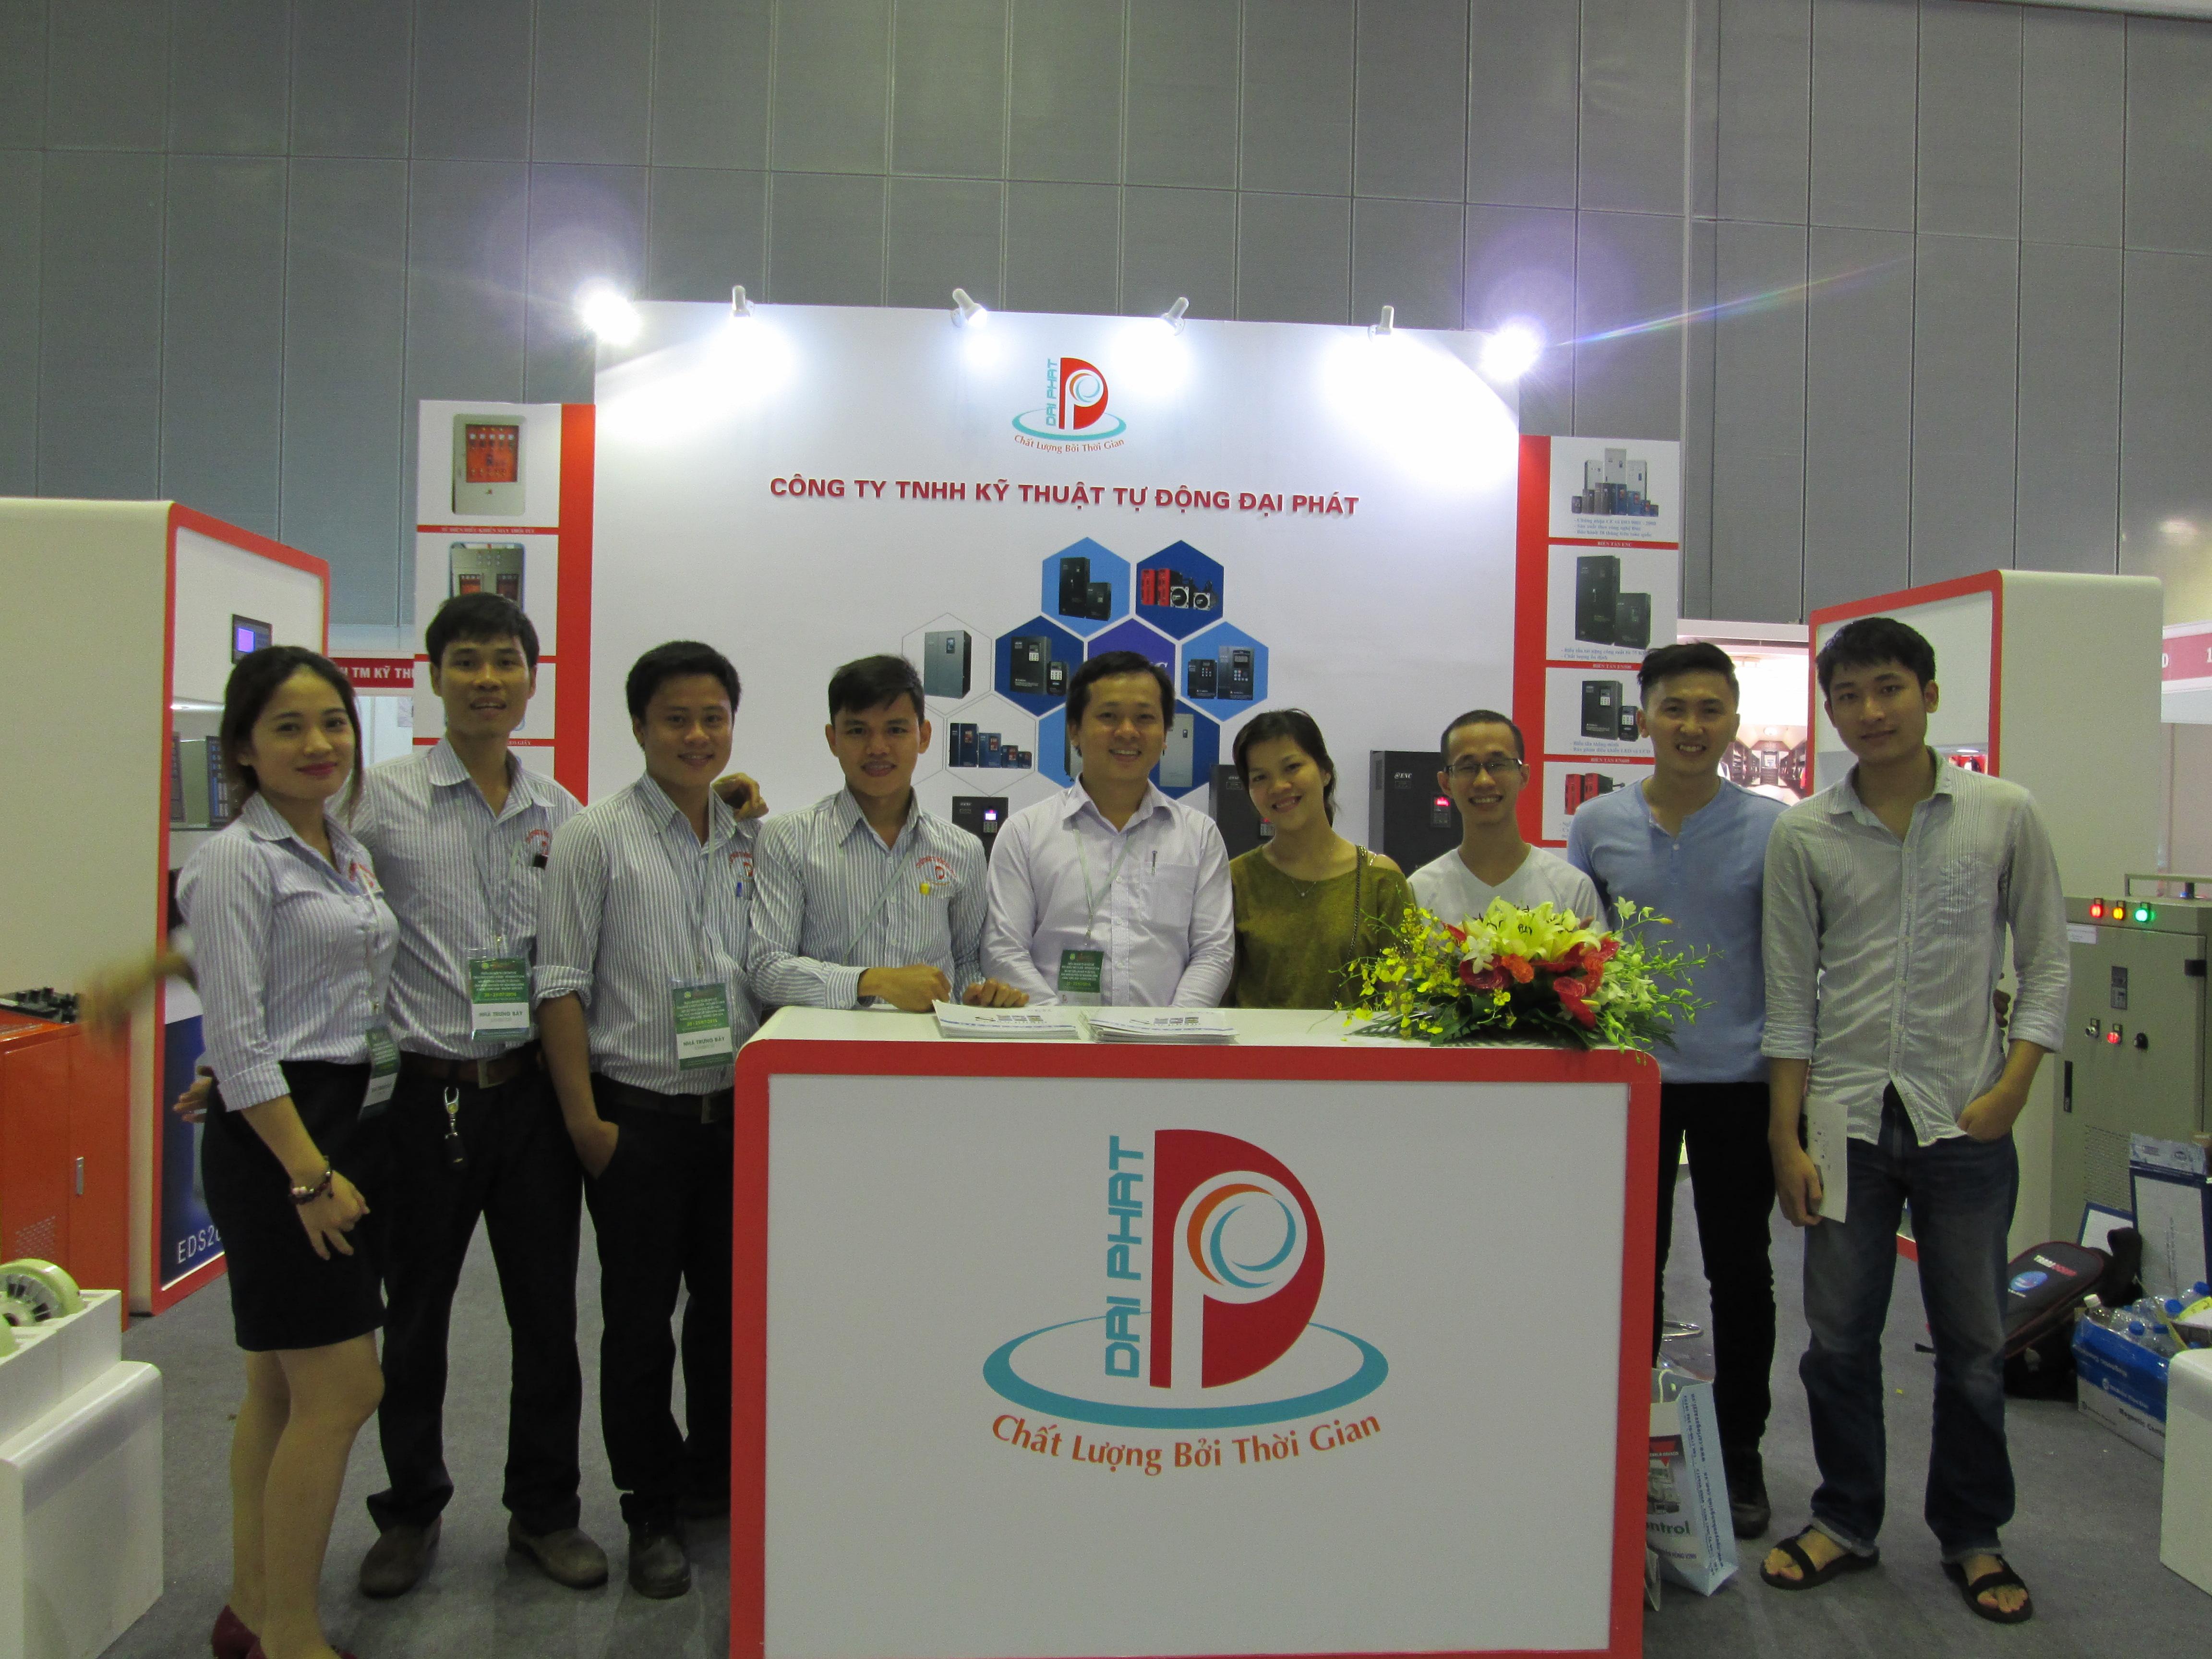 The Sixth International Exhibition